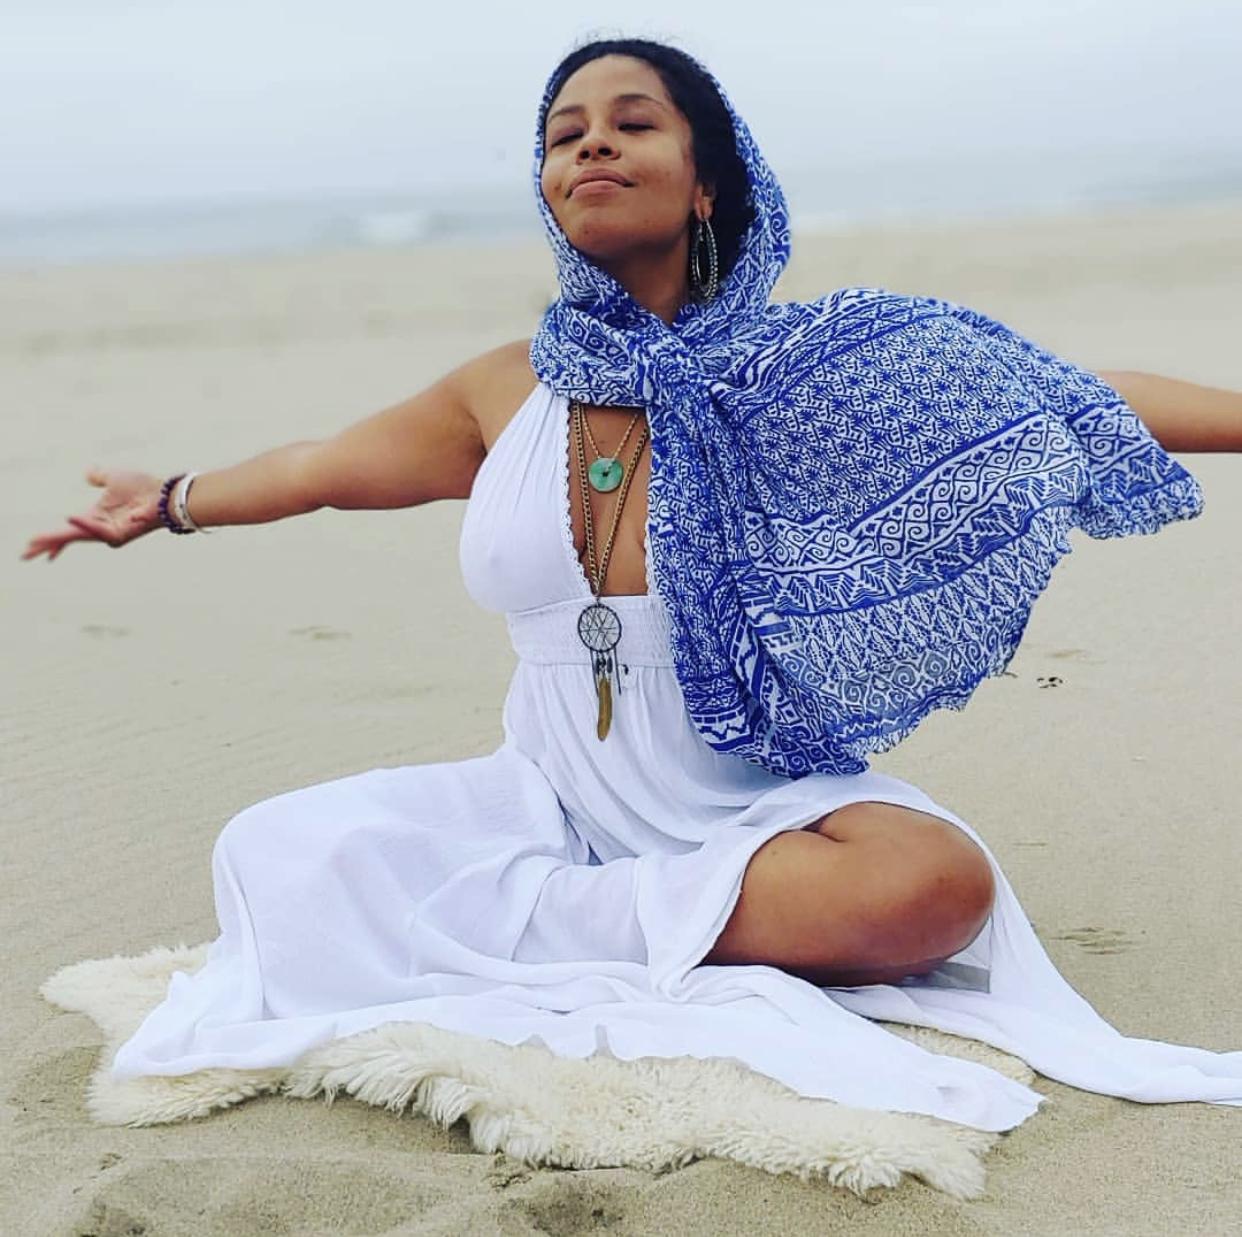 @soulisticwellness GGC #SMALLBIZ SUMMIT Psychotherapist, sound & energy healer